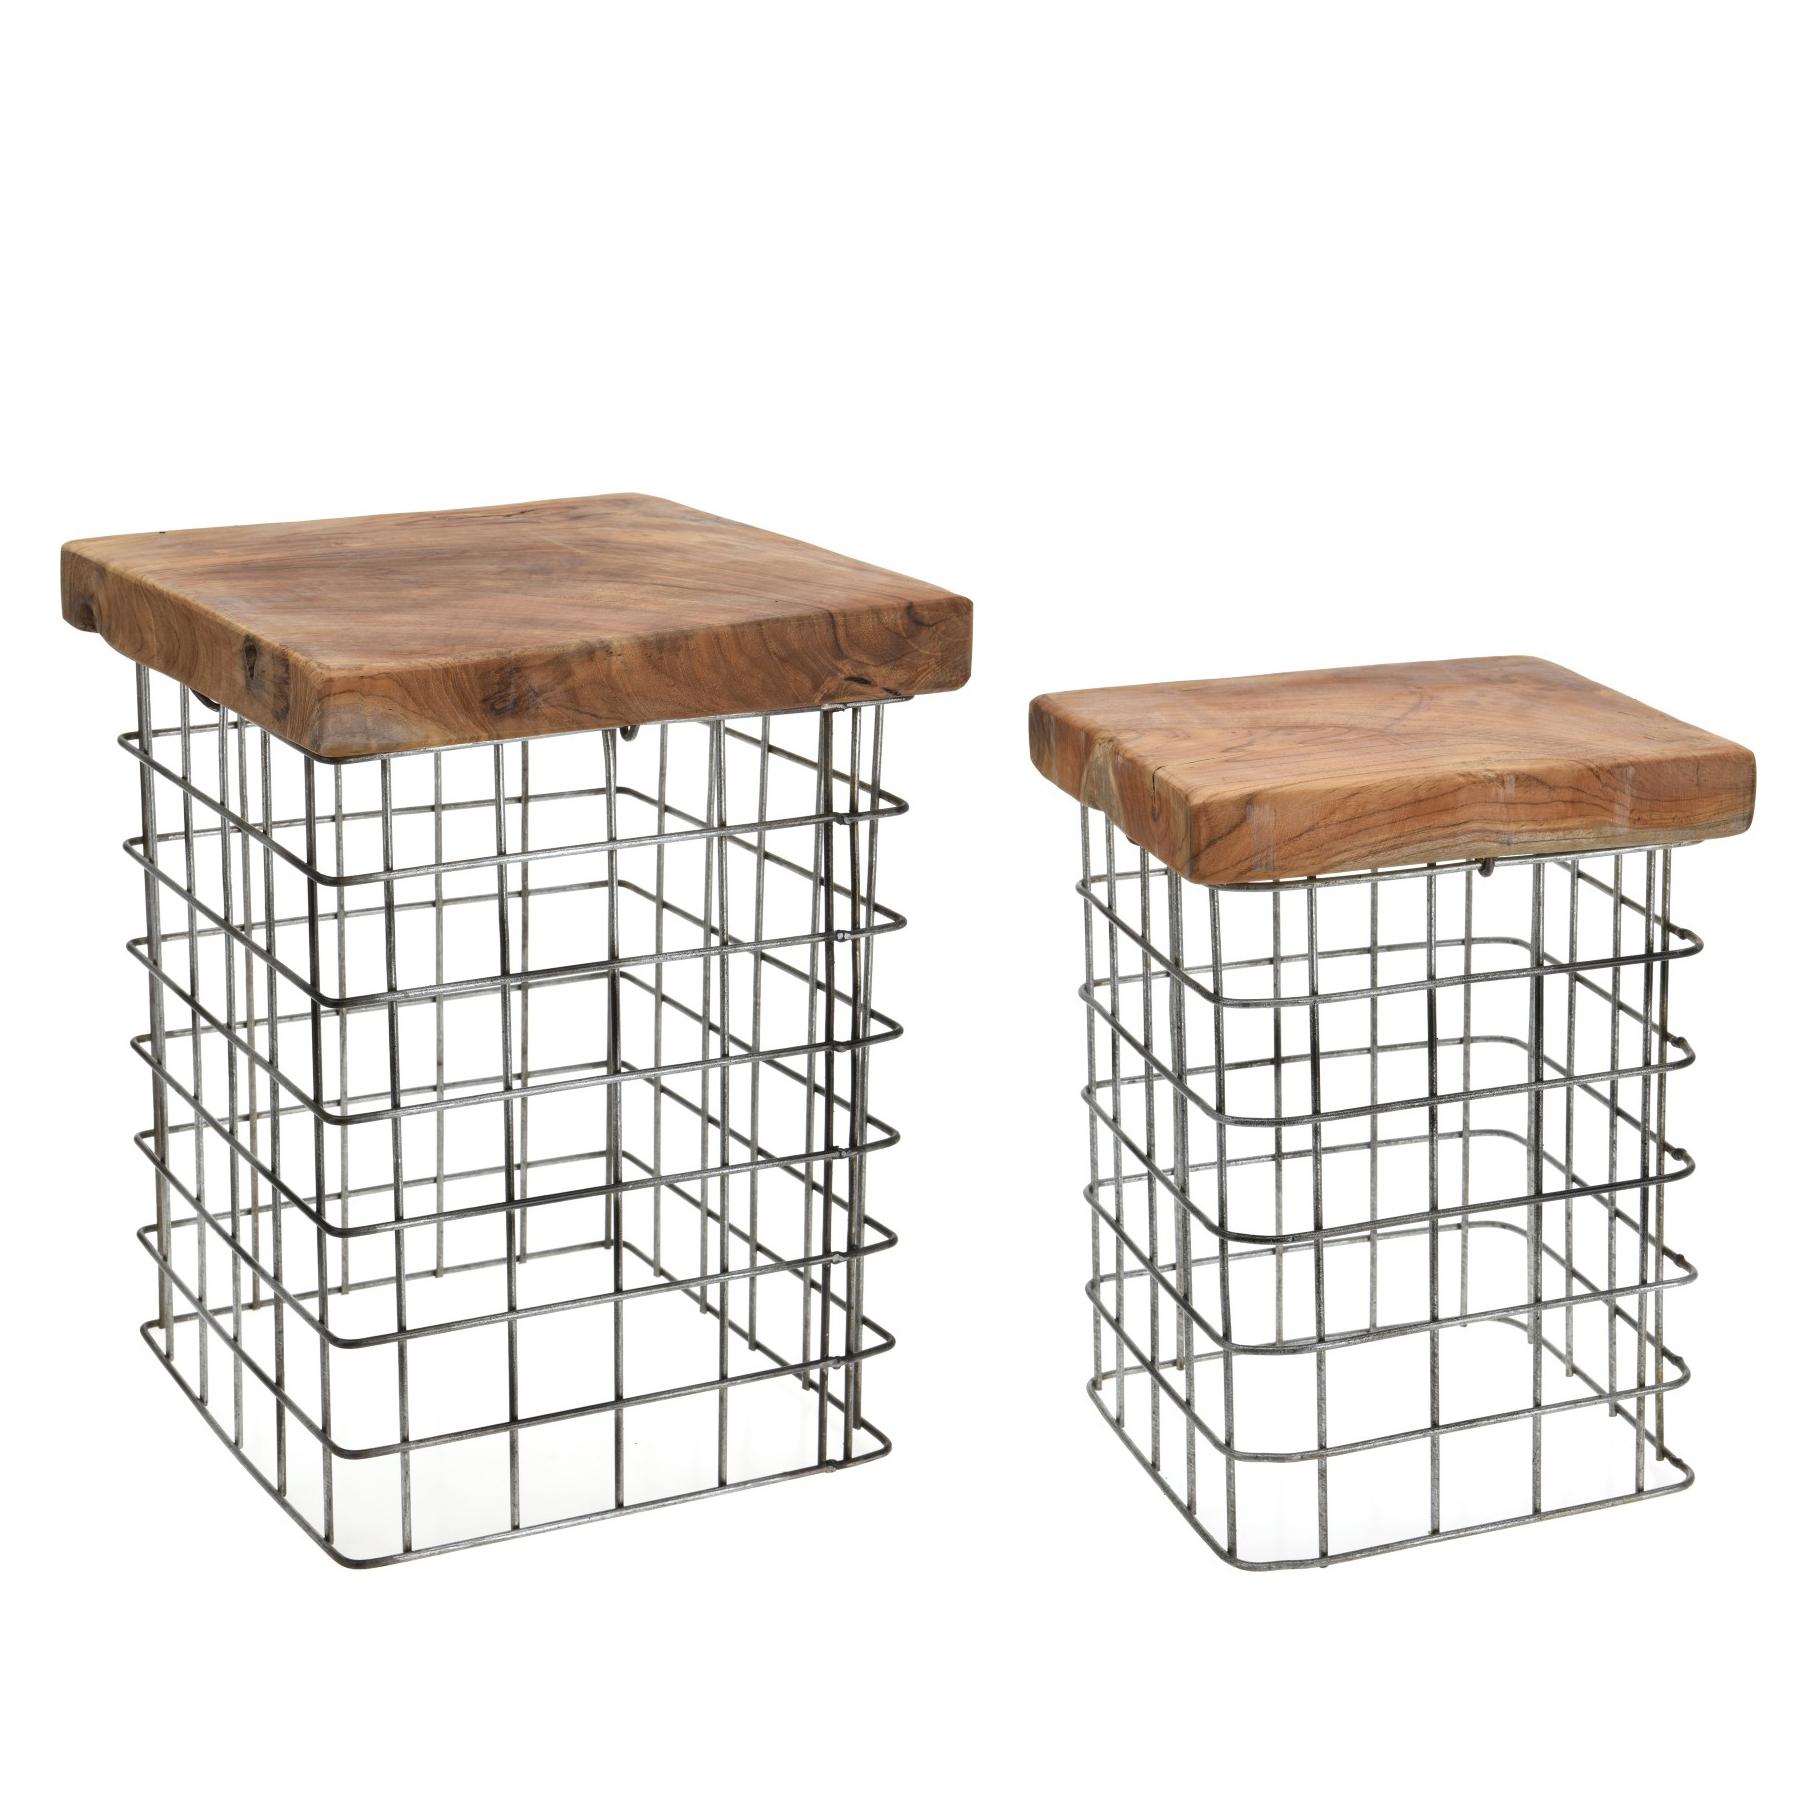 Odkládací stolky Riset čtvercové, 30 cm, sada 2 ks